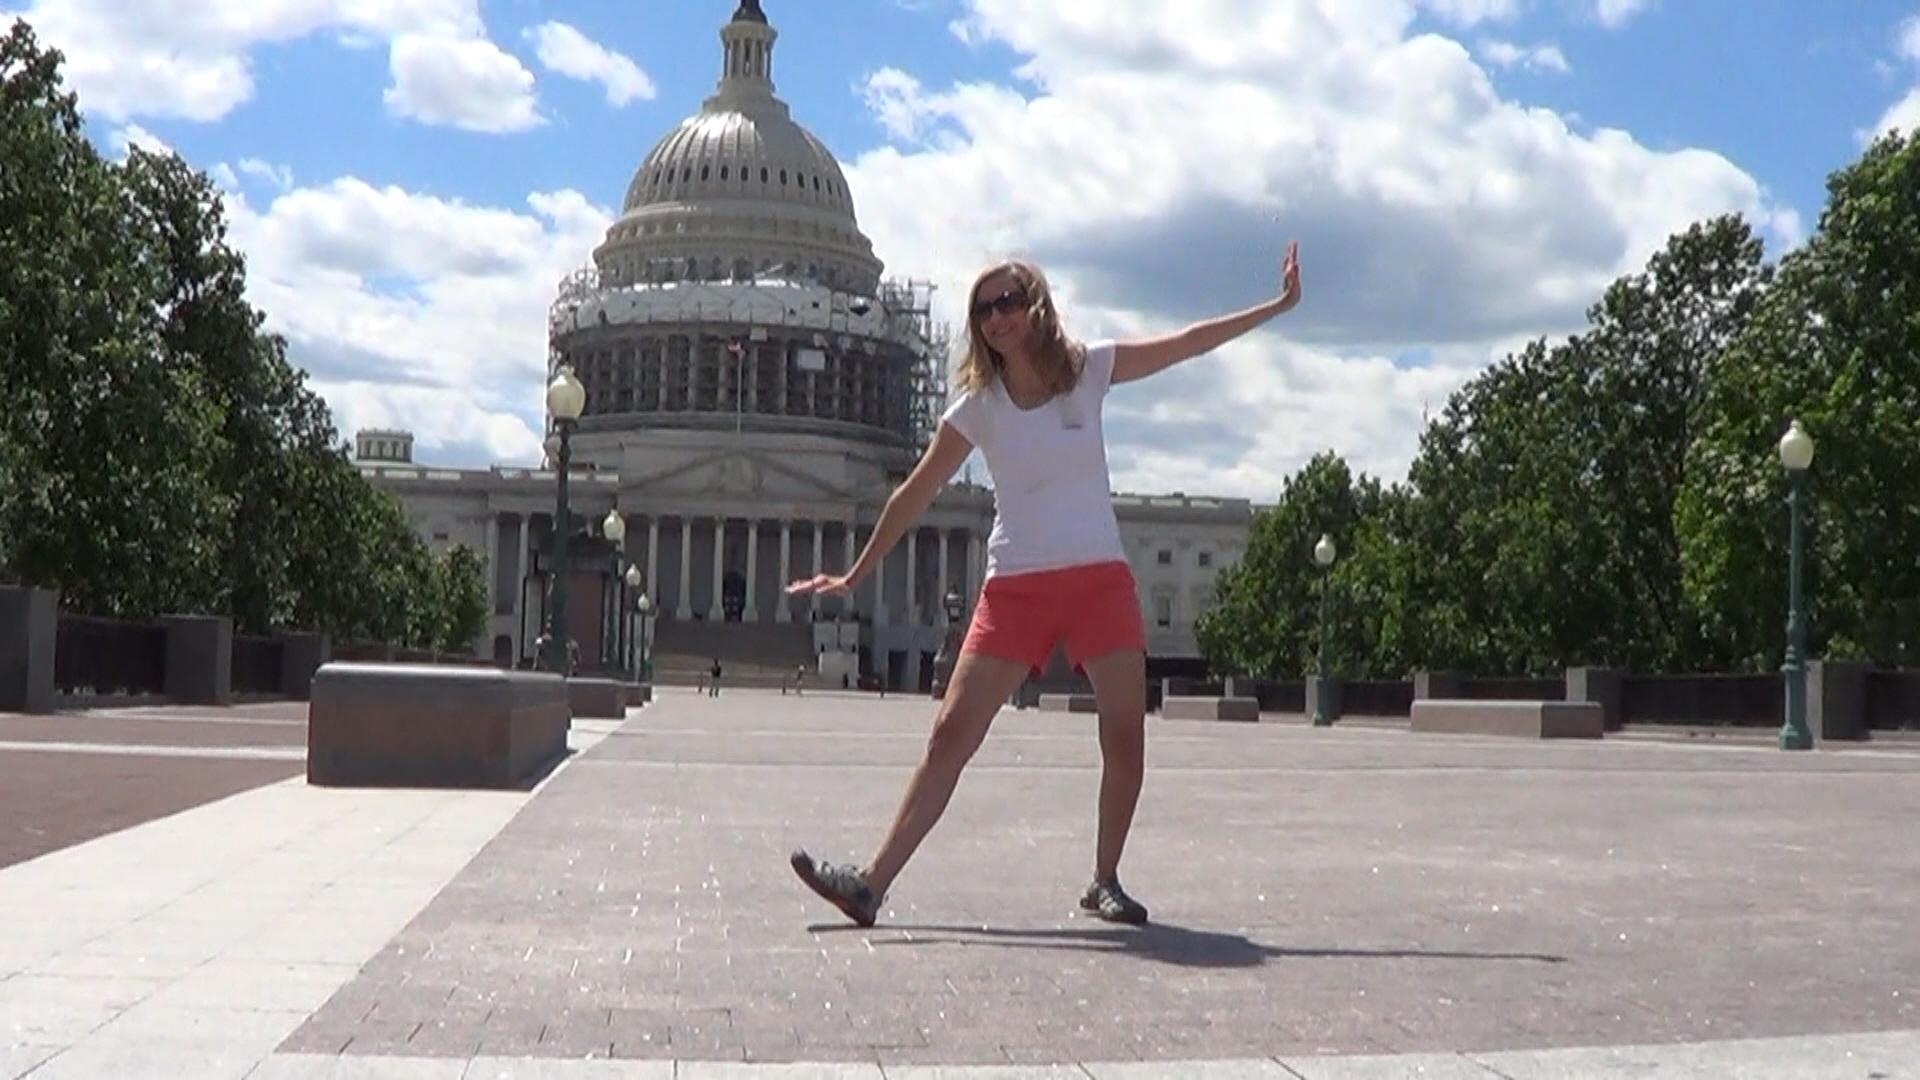 12 - US Capitol